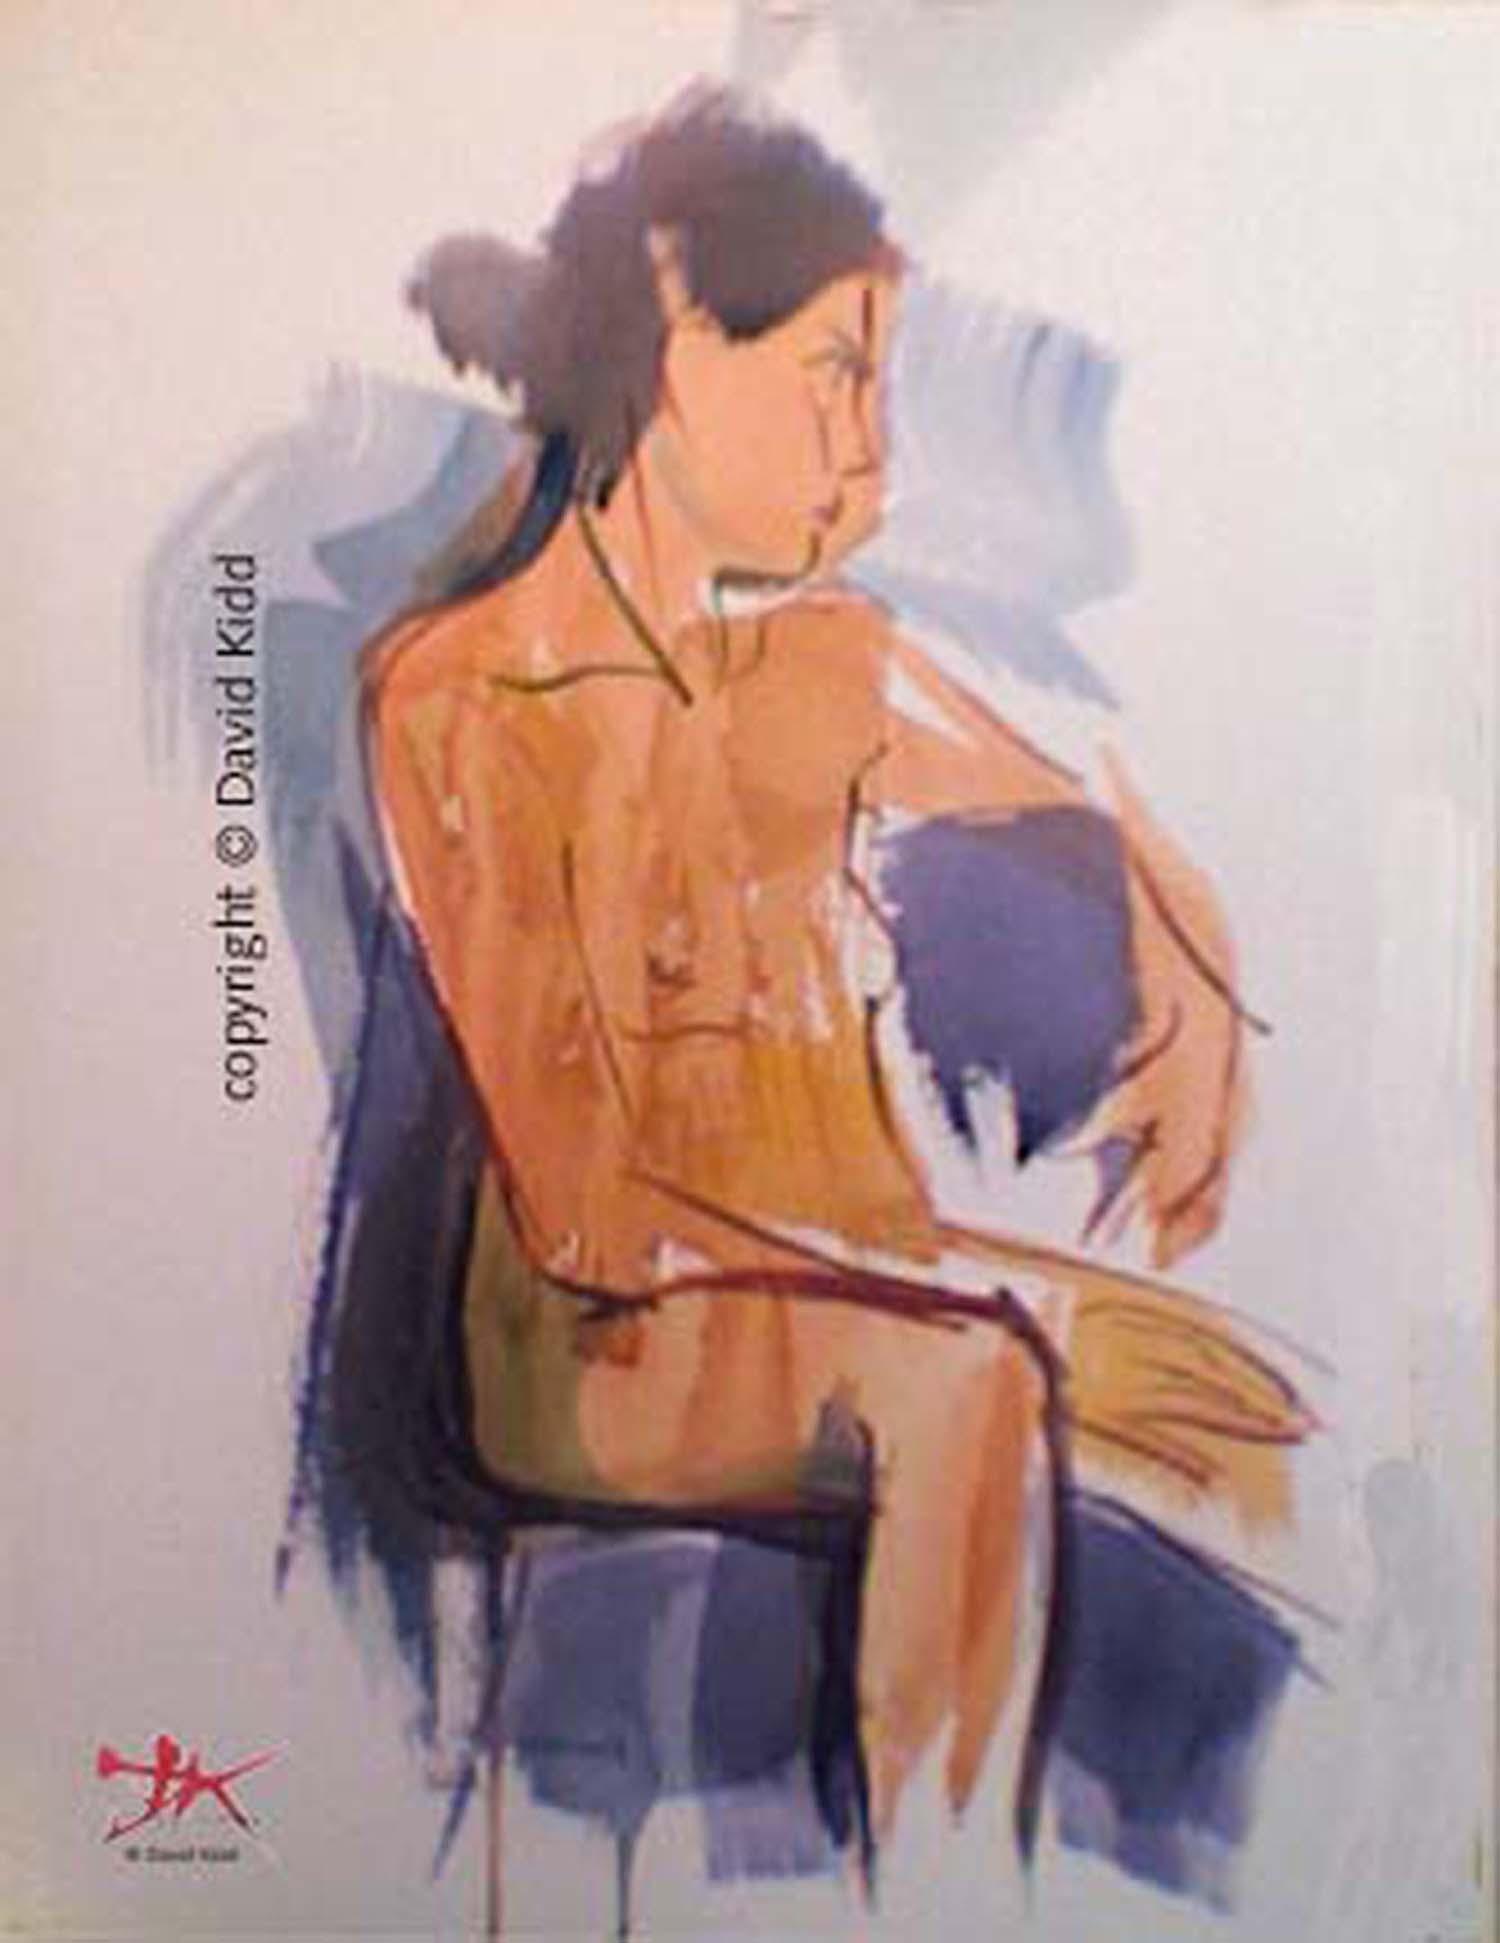 Nude-Looking-2-by-David-Kidd-1500.jpg